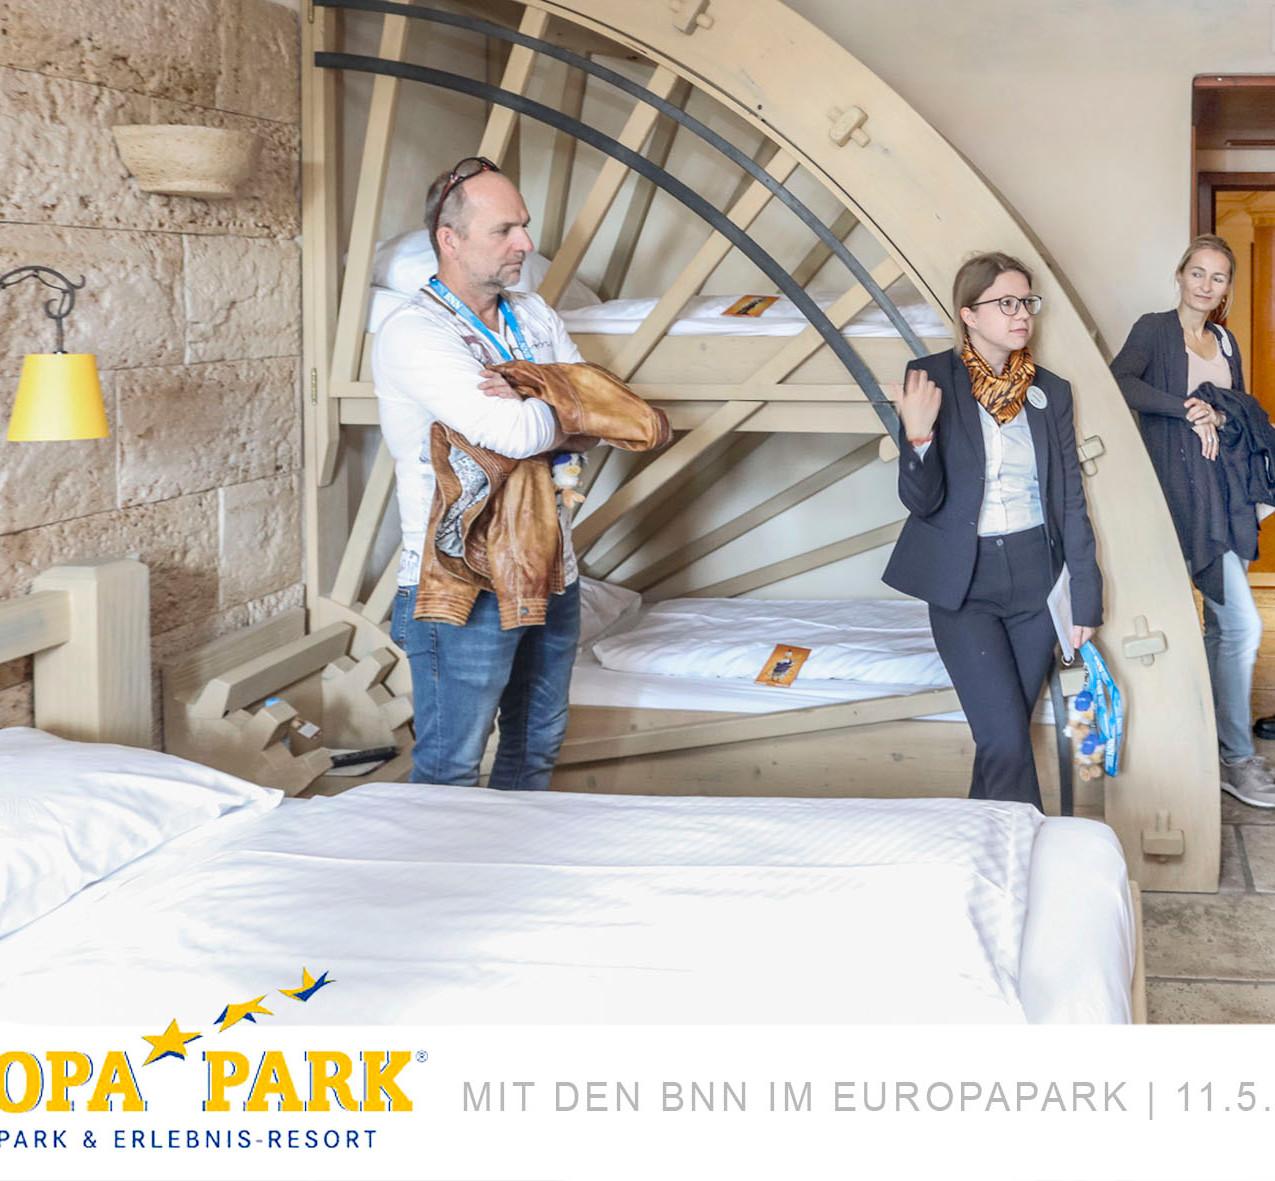 20190510_FB_Europapark_6